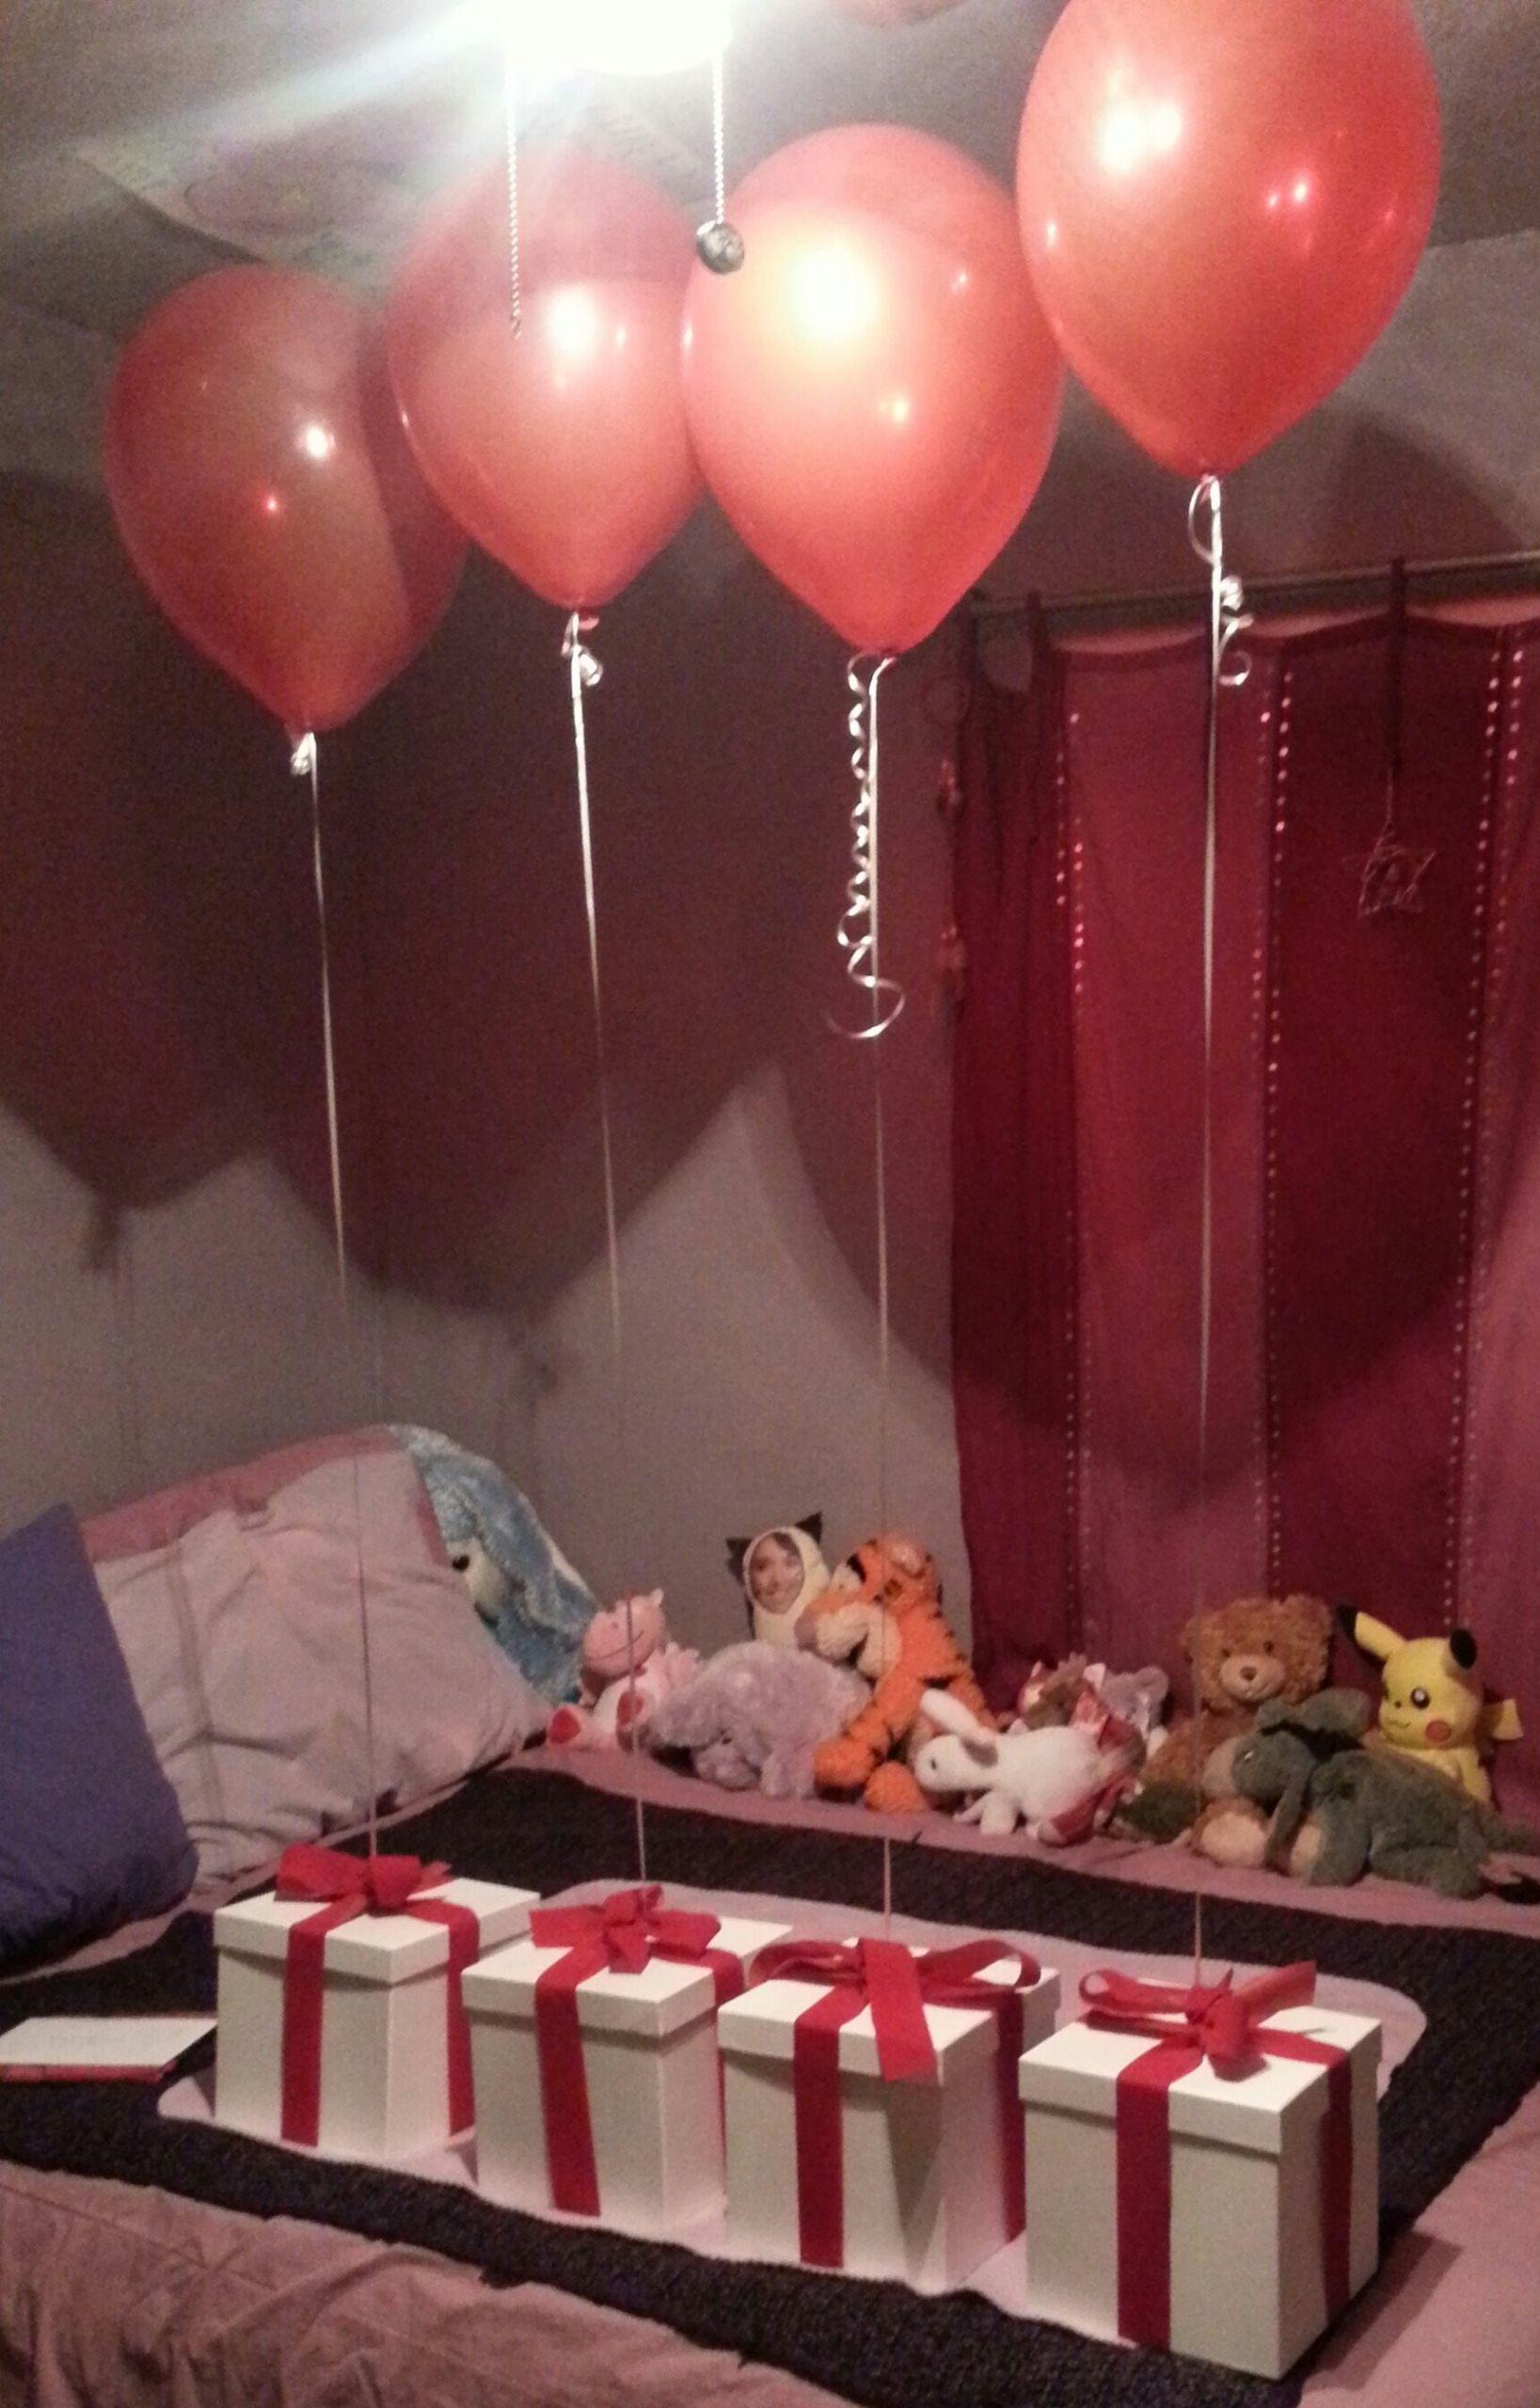 Cute Sentimental Gift Ideas For Boyfriend  10 Lovable Romantic Birthday Gift Ideas Boyfriend 2020